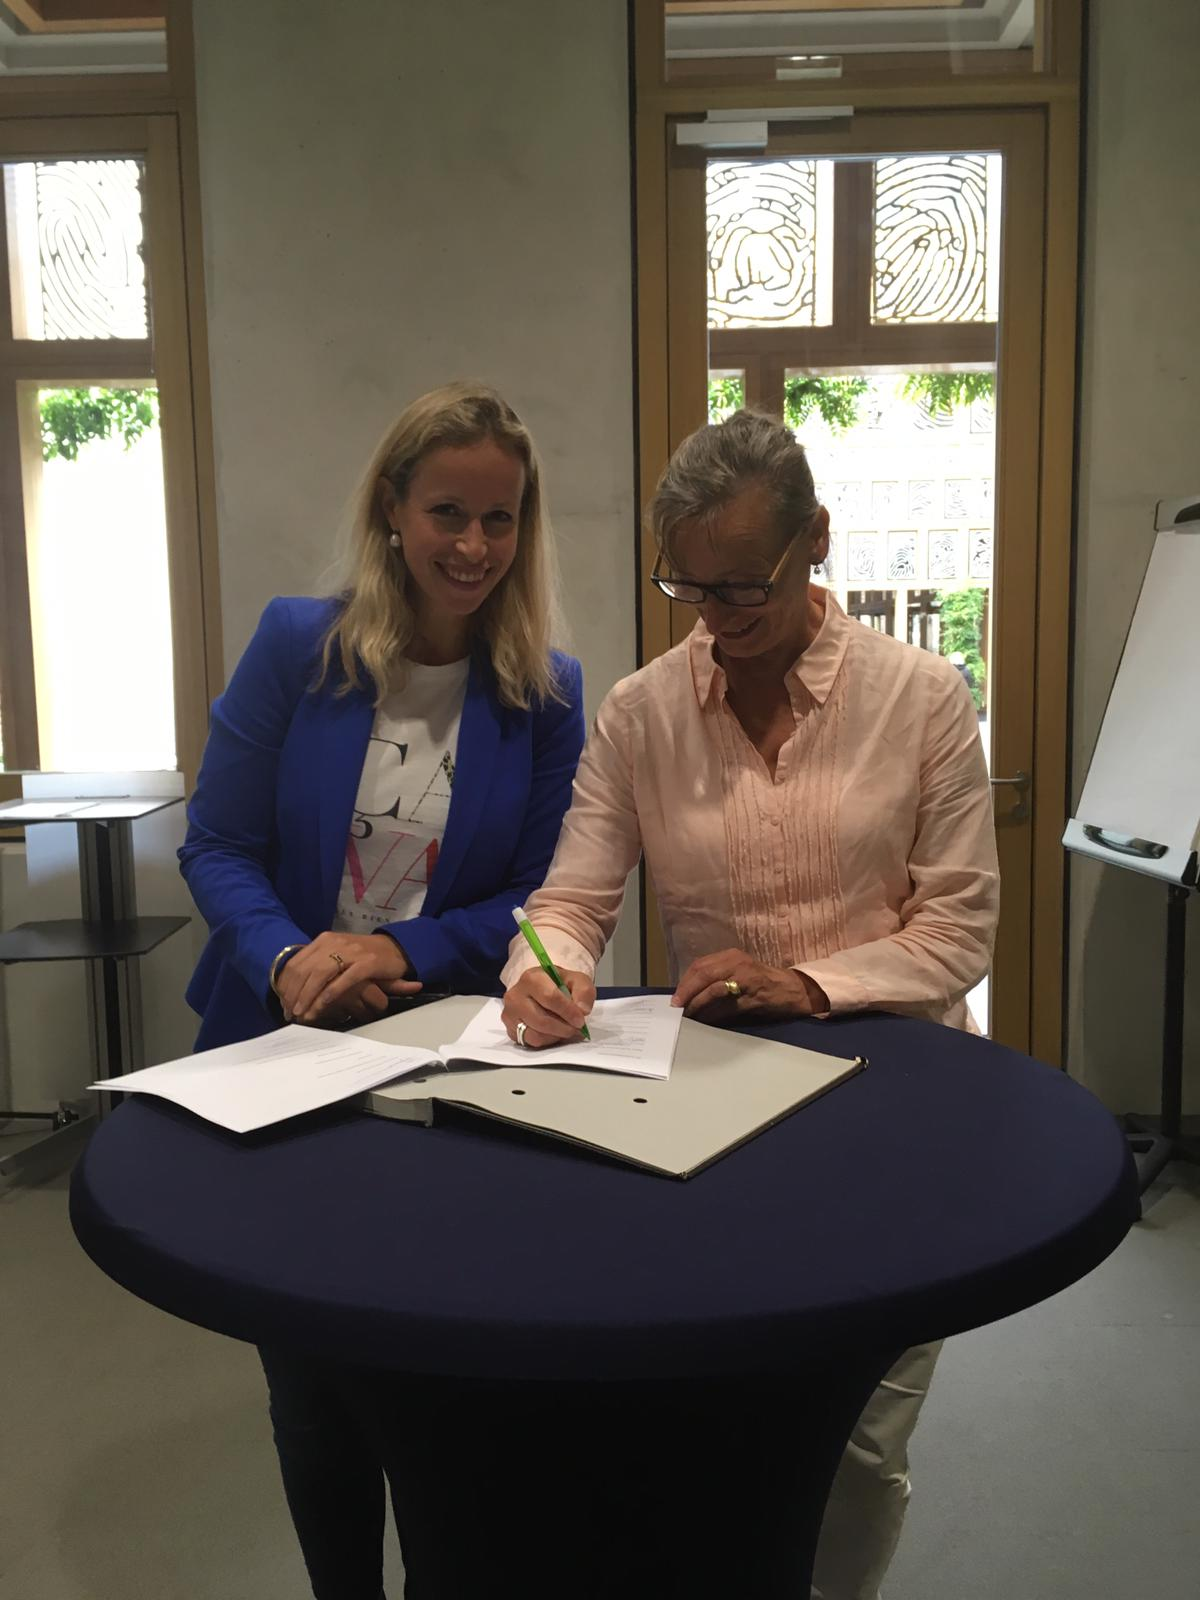 Ondertekening convenant Jonge Kind & VVE 2019-2022